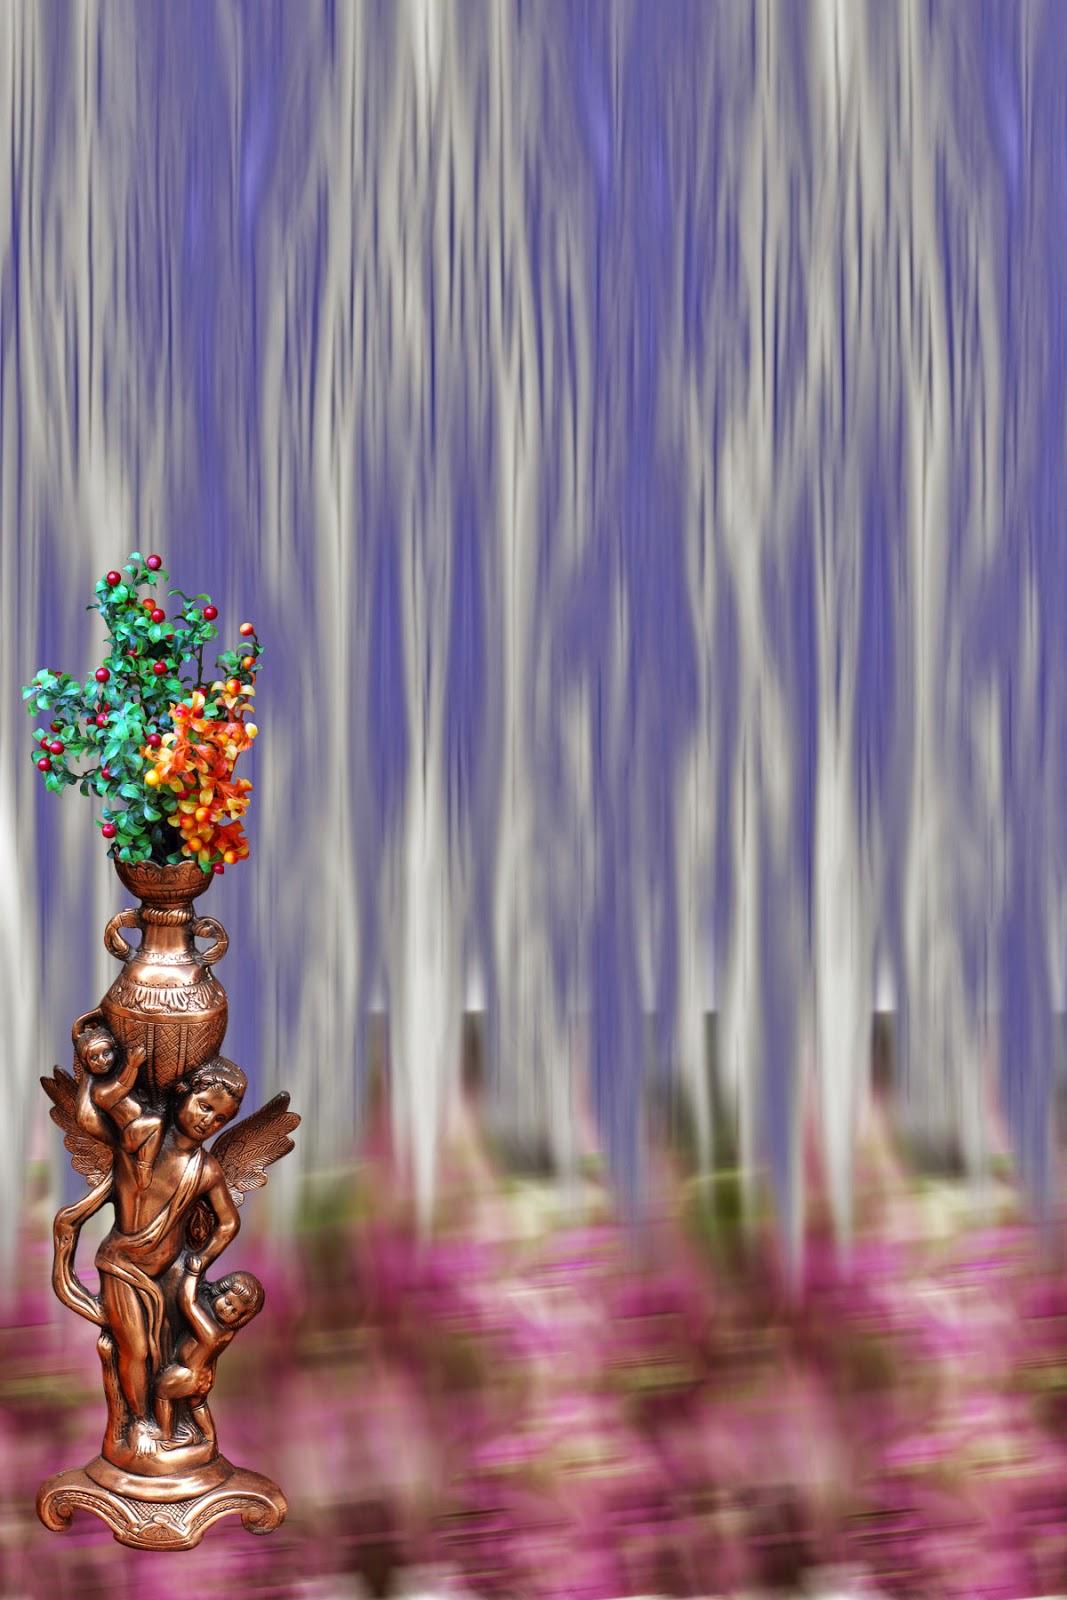 Studio Background hd 1080p - StudioPk - Get Free Wedding Album Design